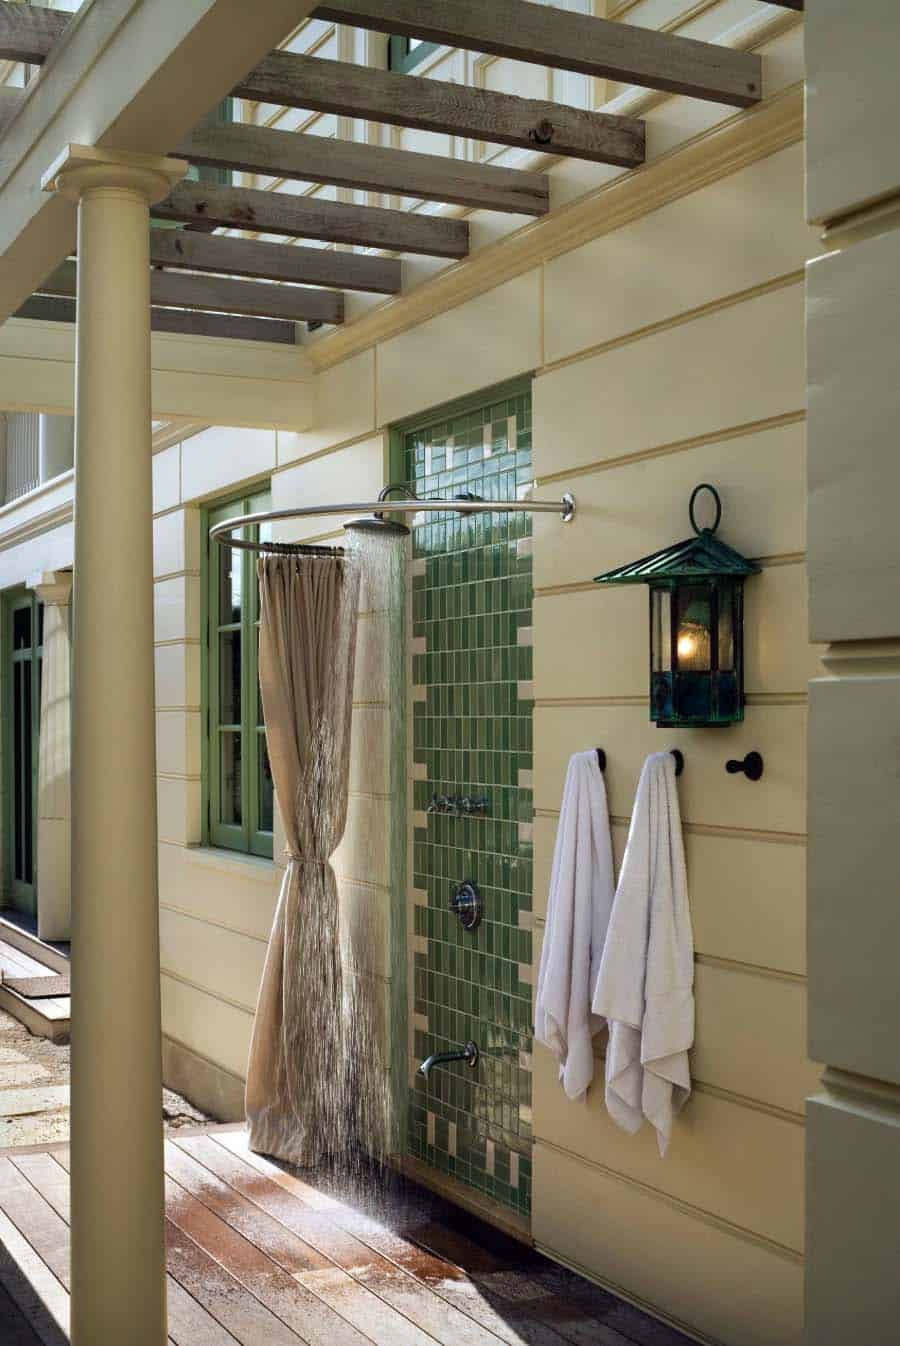 30 invigorating outdoor shower ideas